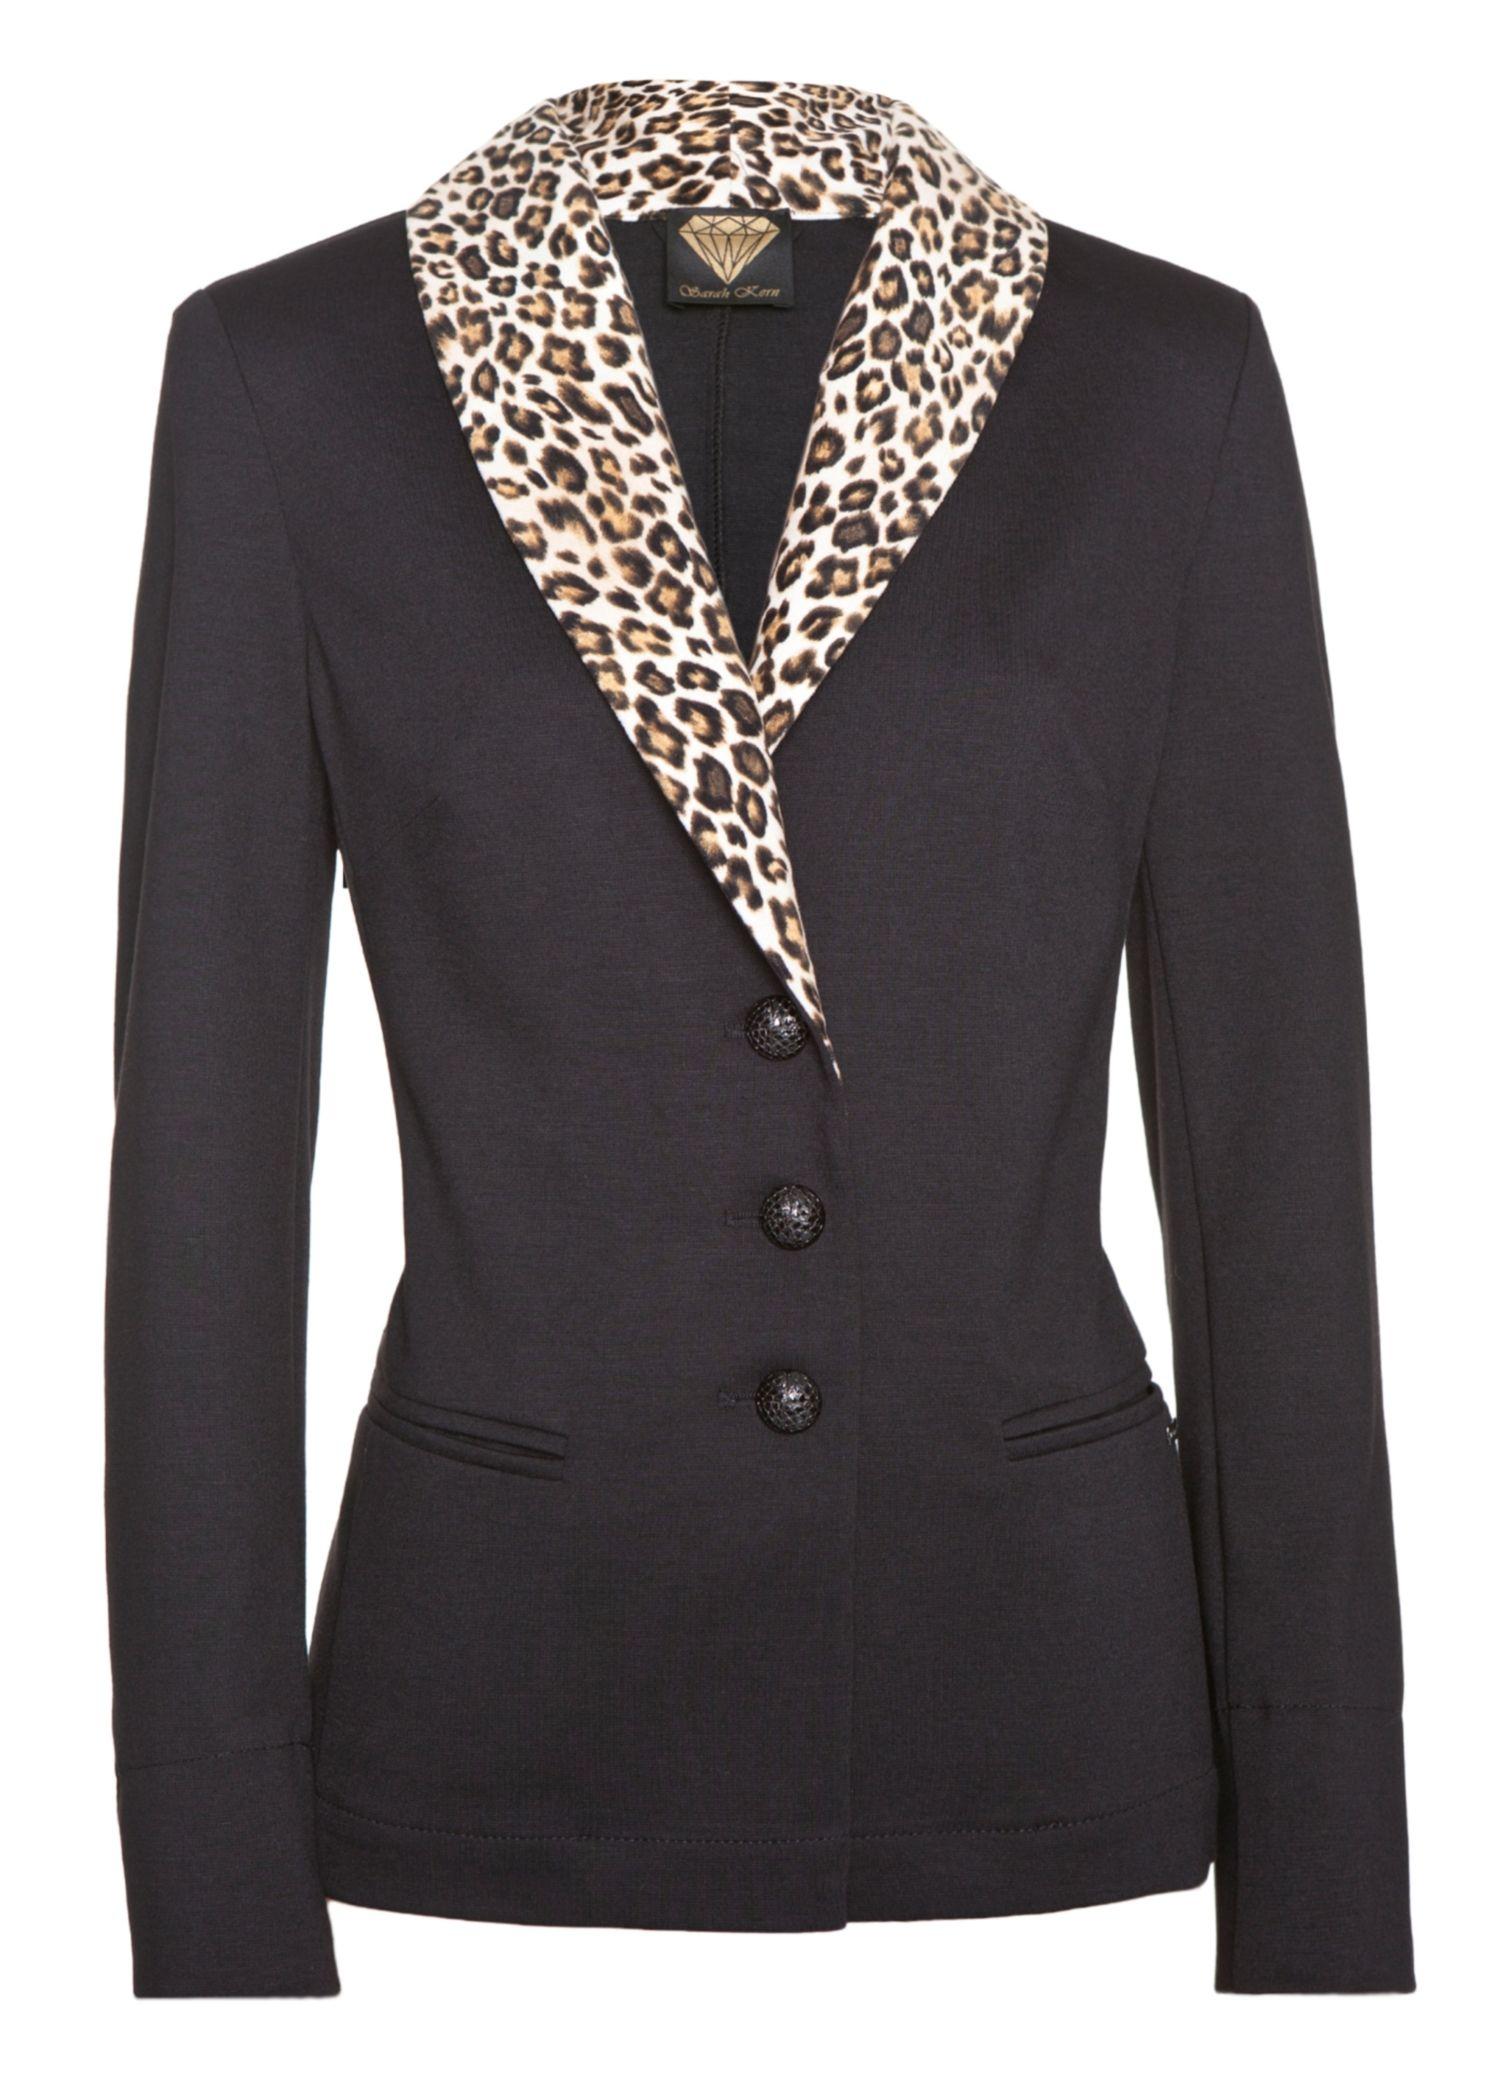 f9d5e5454a72 Sarah Kern | Women's Fashion | Blazer mit Reverskragen | #HSE24 #clothing # jacket